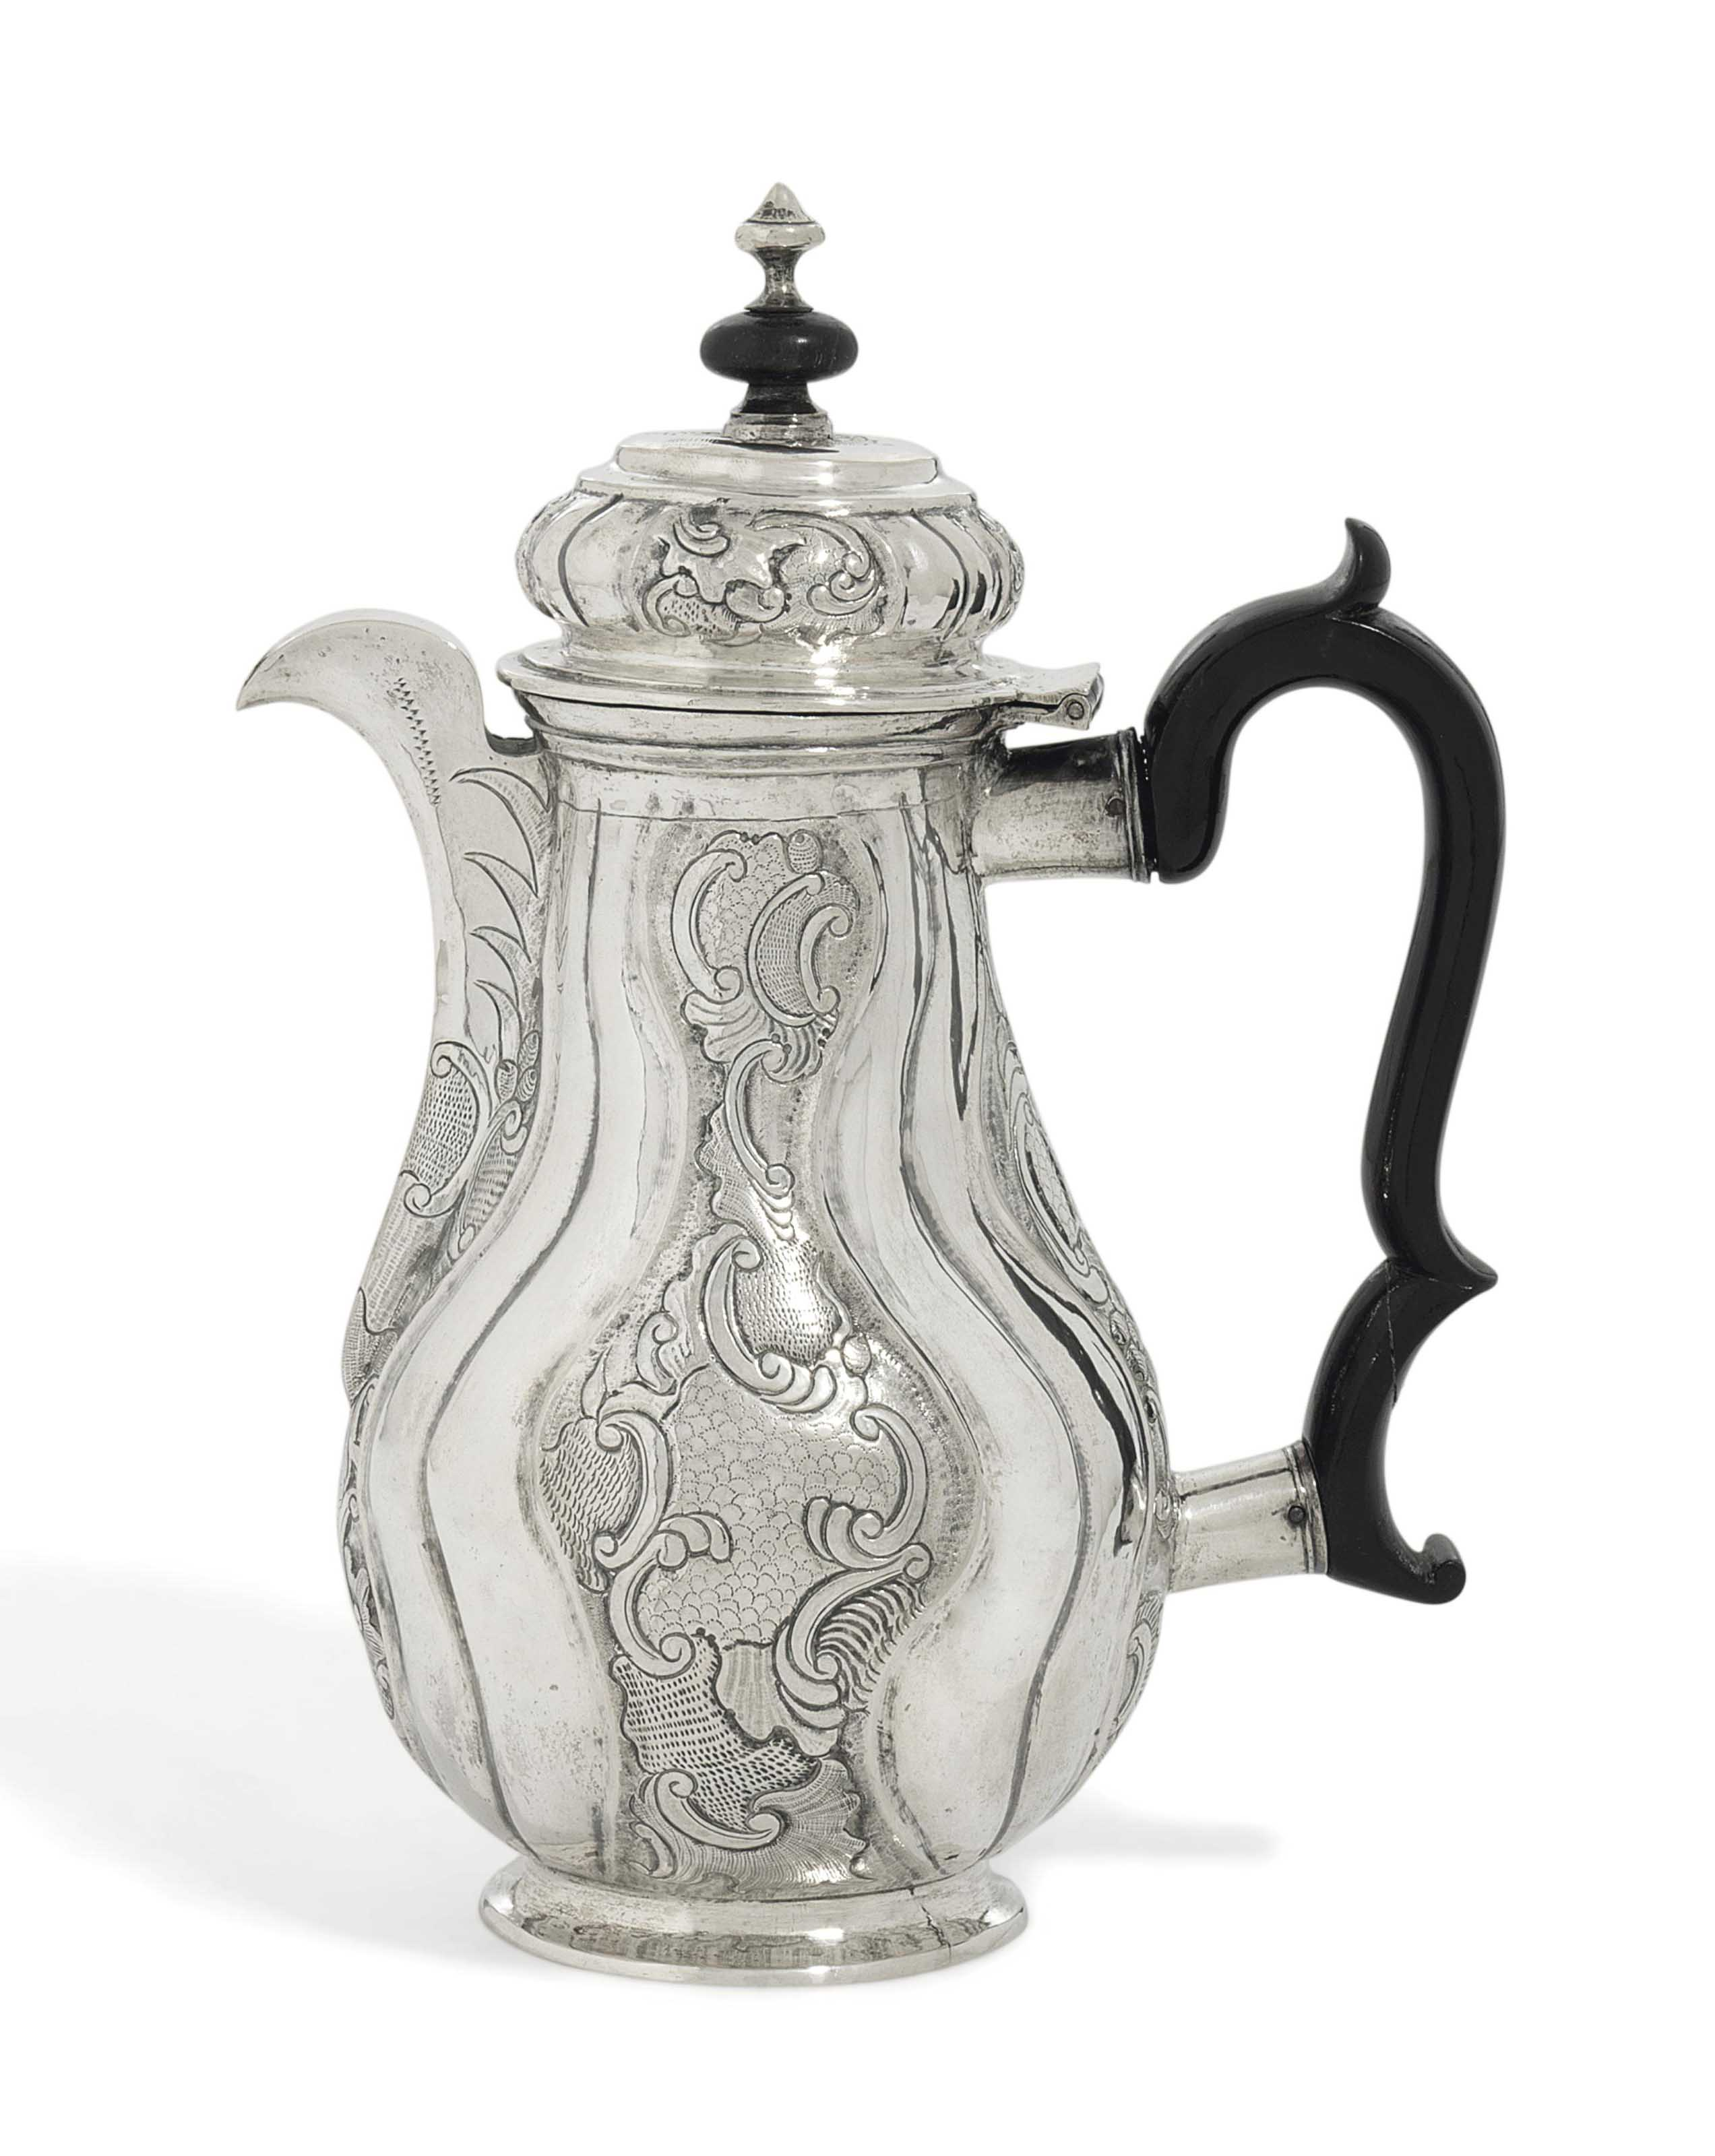 A RUSSIAN SILVER COFFEE-POT